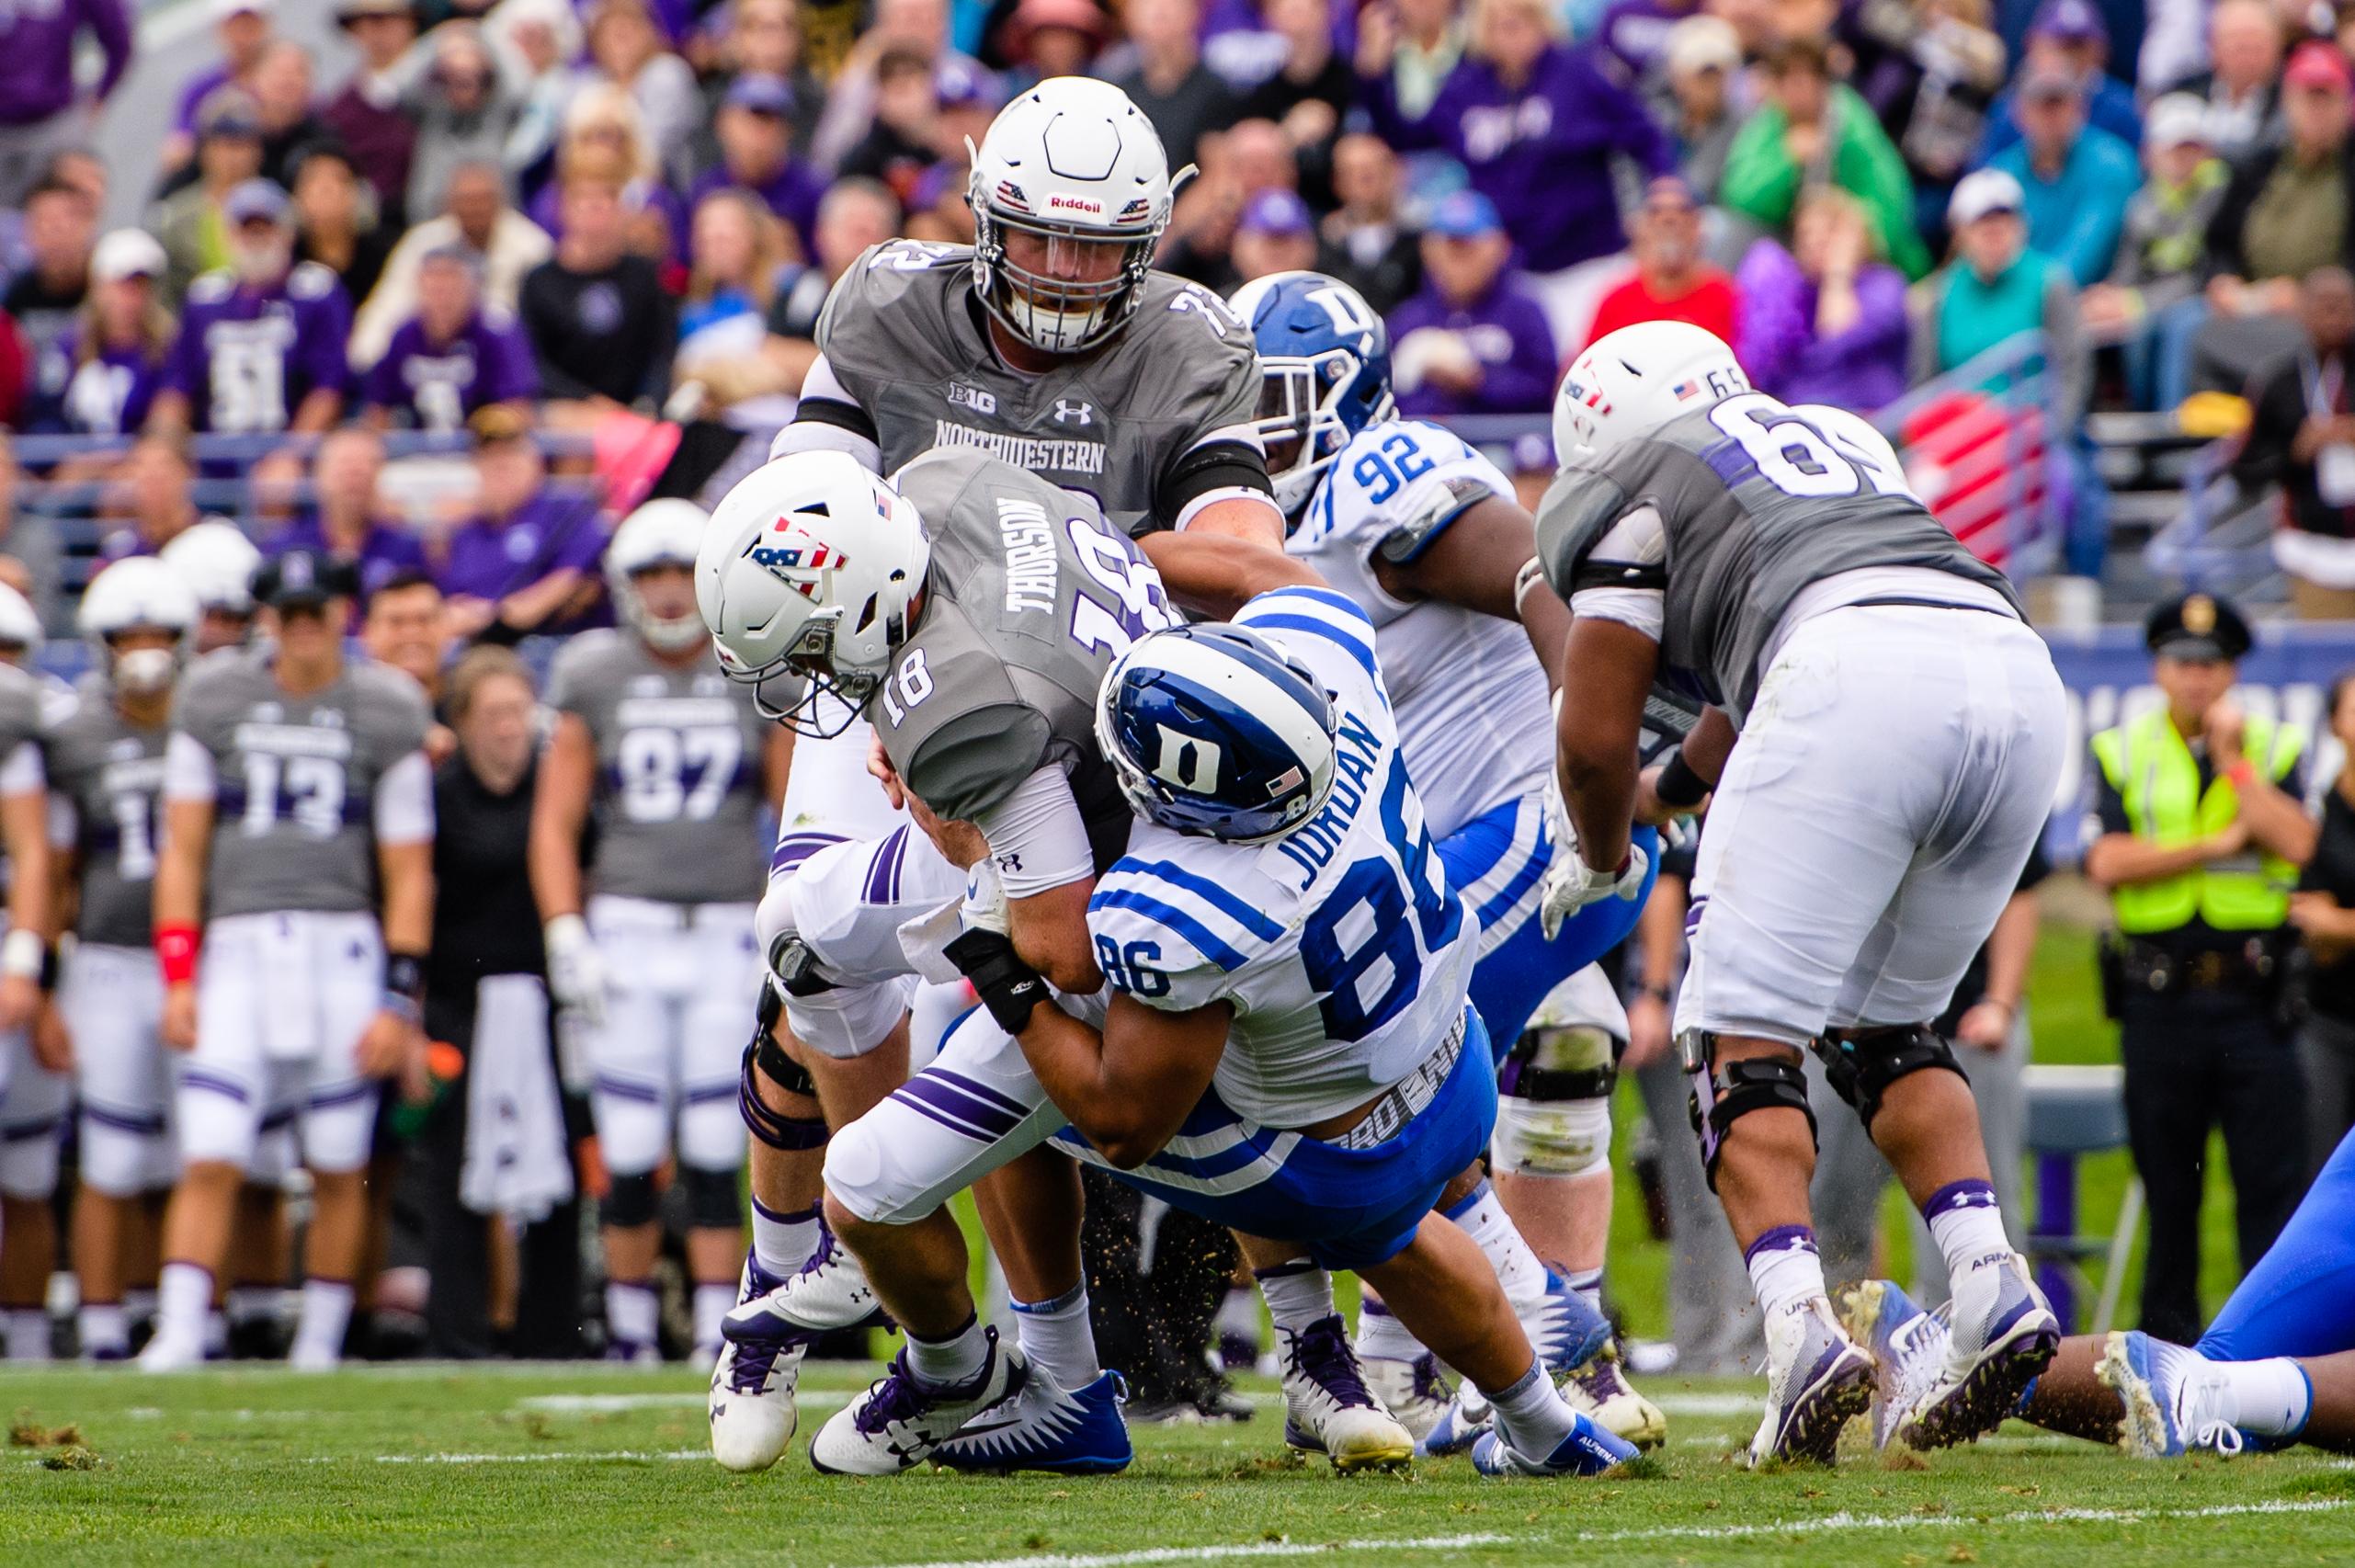 COLLEGE FOOTBALL: SEP 08 Duke at Northwestern